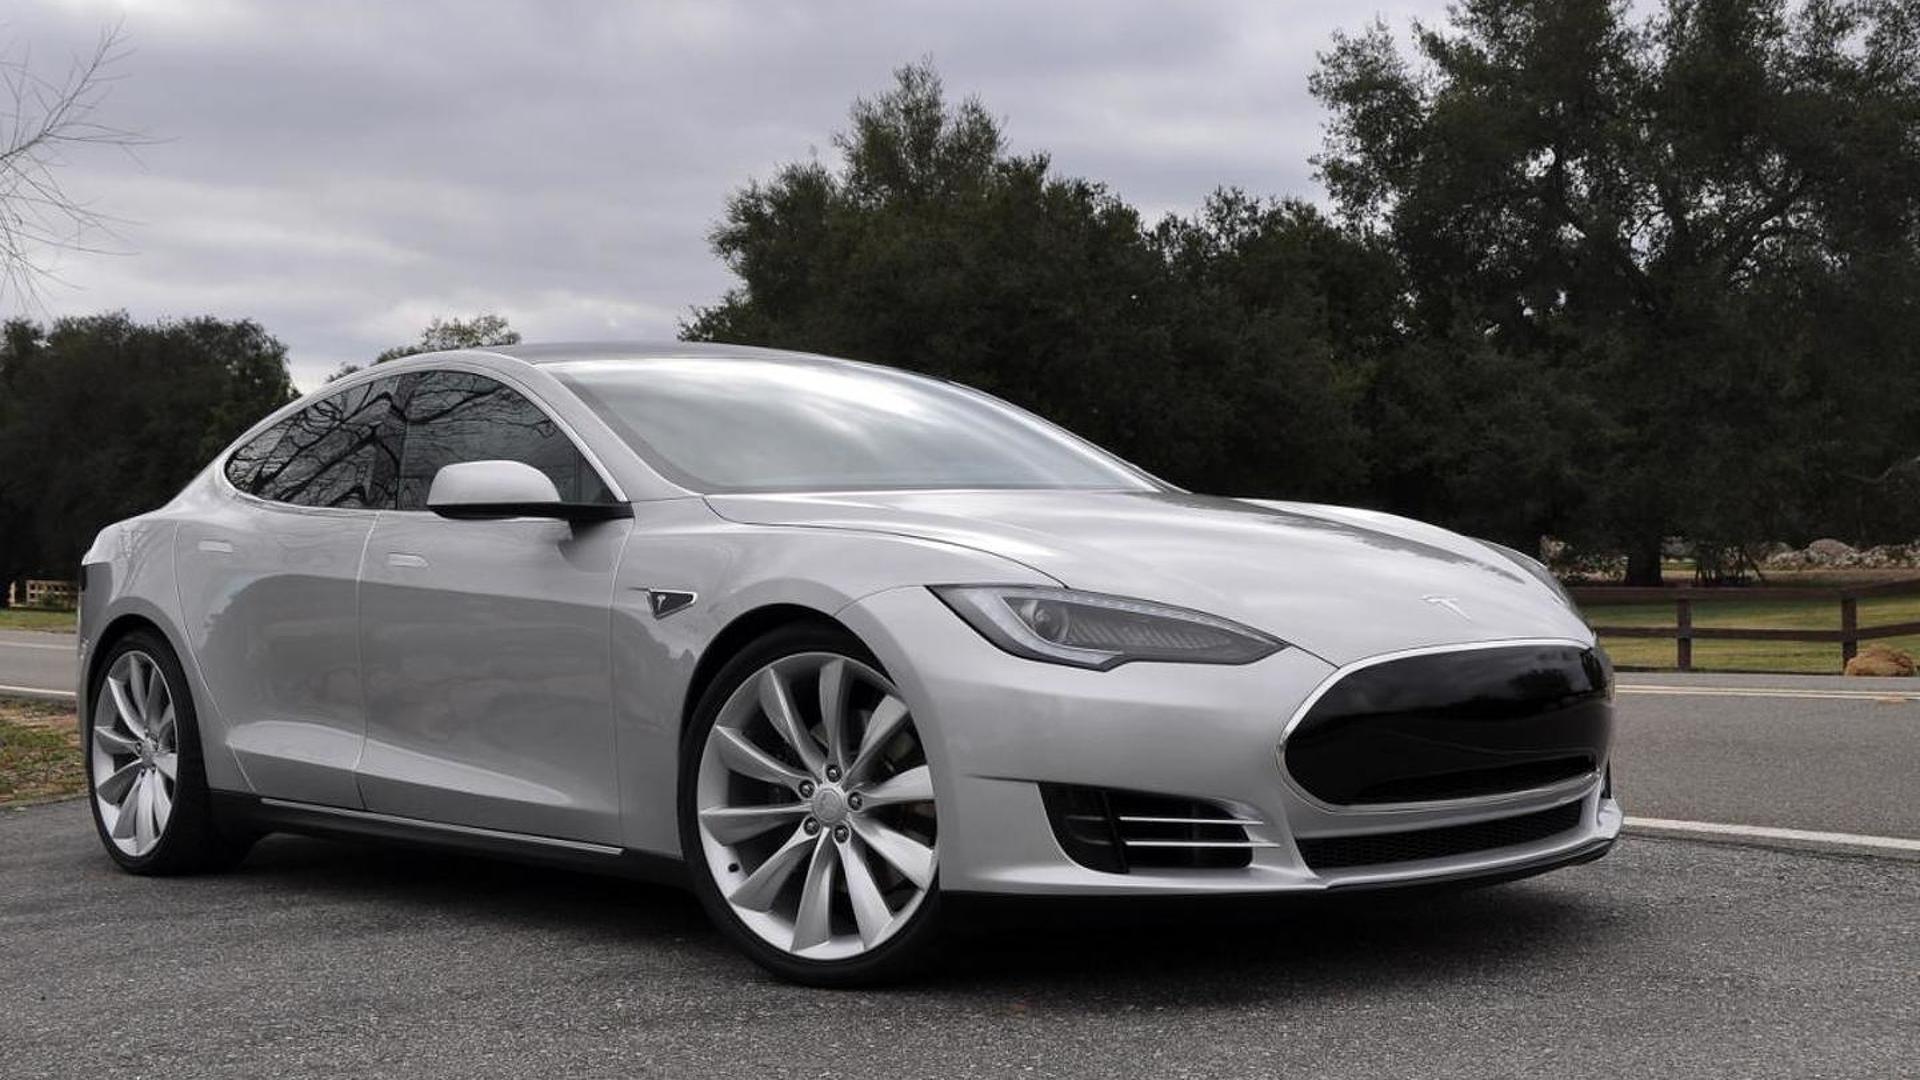 Tesla Roadster and Model S ride together [video]